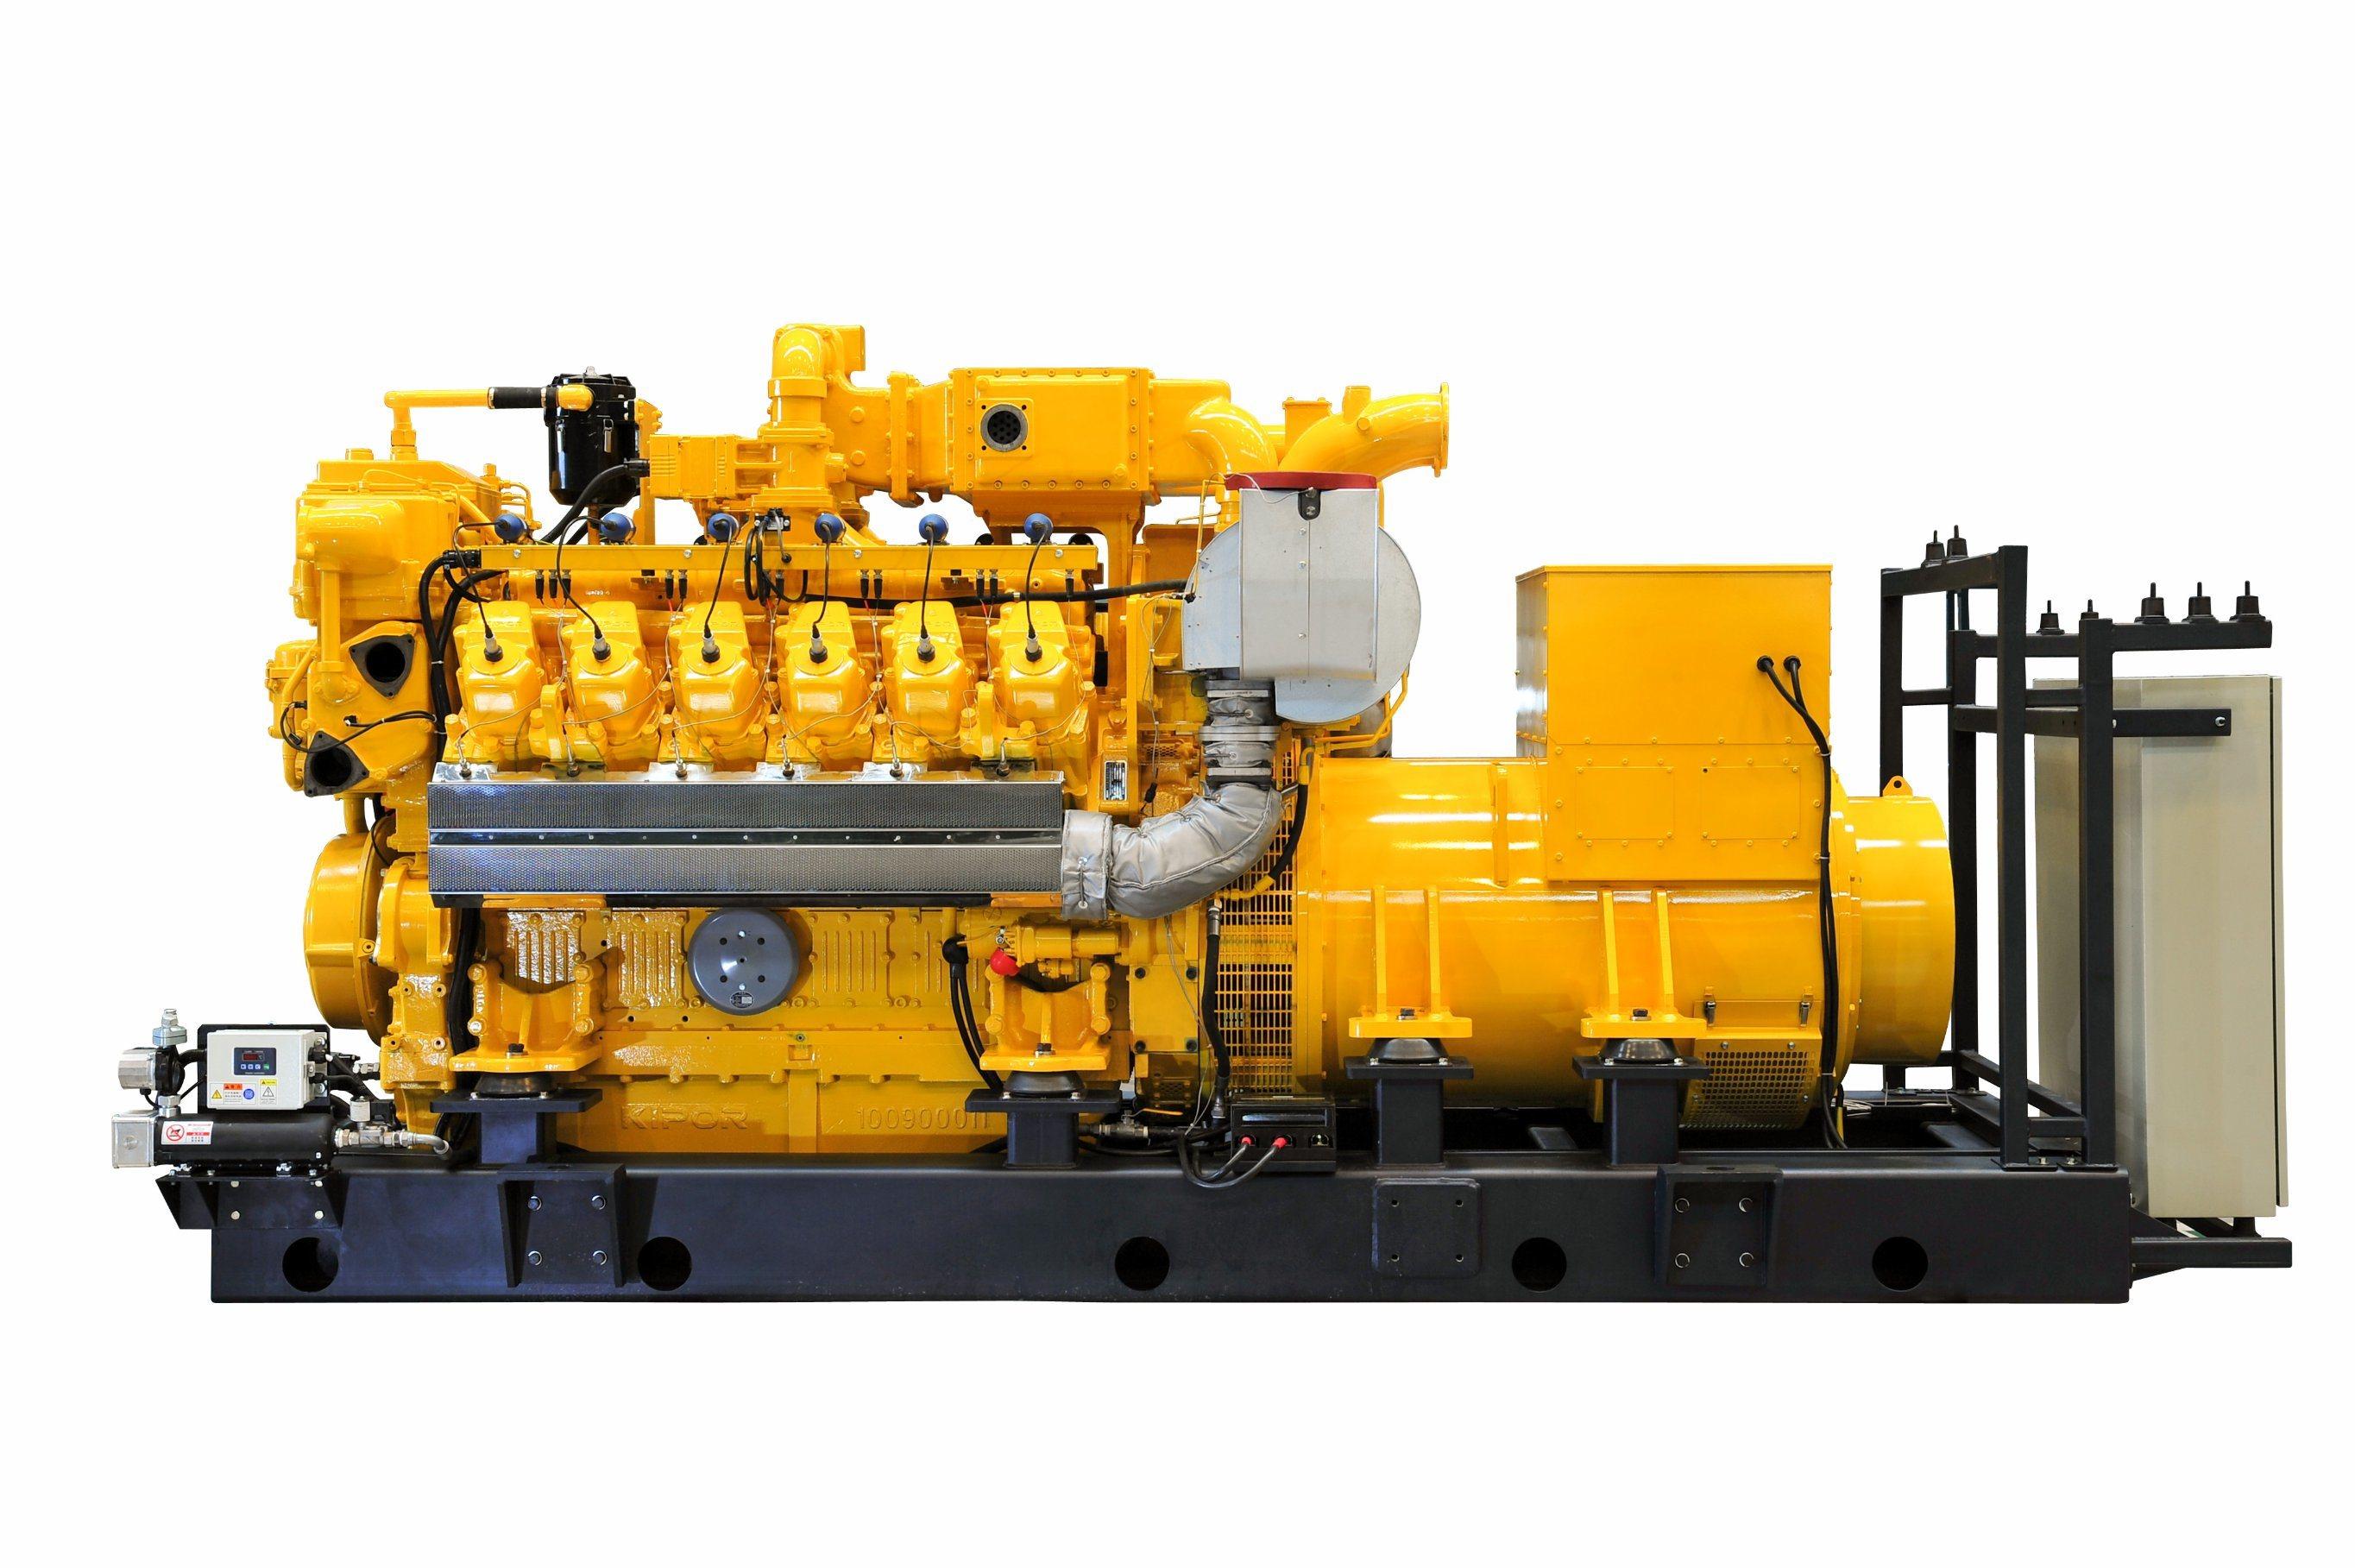 Kipor LPG/Sewage/ Concentration Gas/Wellhead Gas Generator Sets 320kw-1760kw